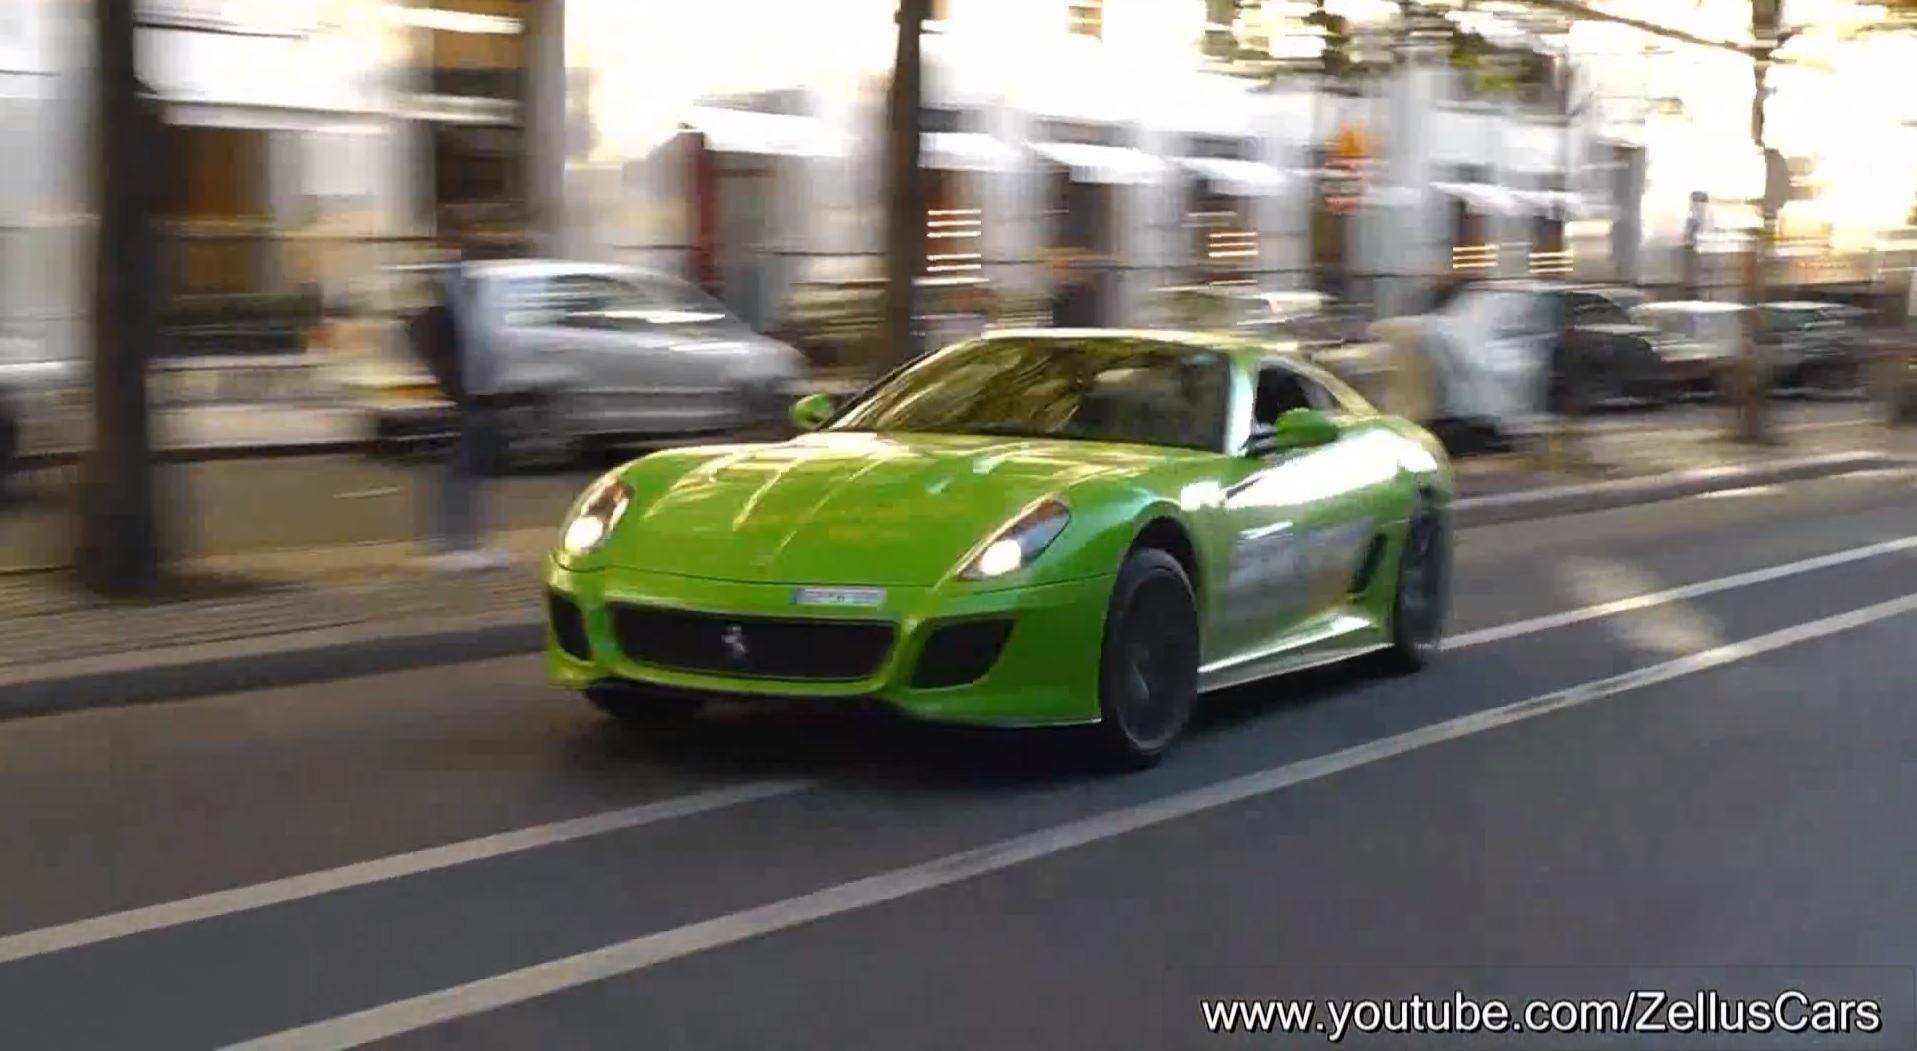 Ferrari 599 GTO going crazy in Paris - www.hartvoorautos.nl